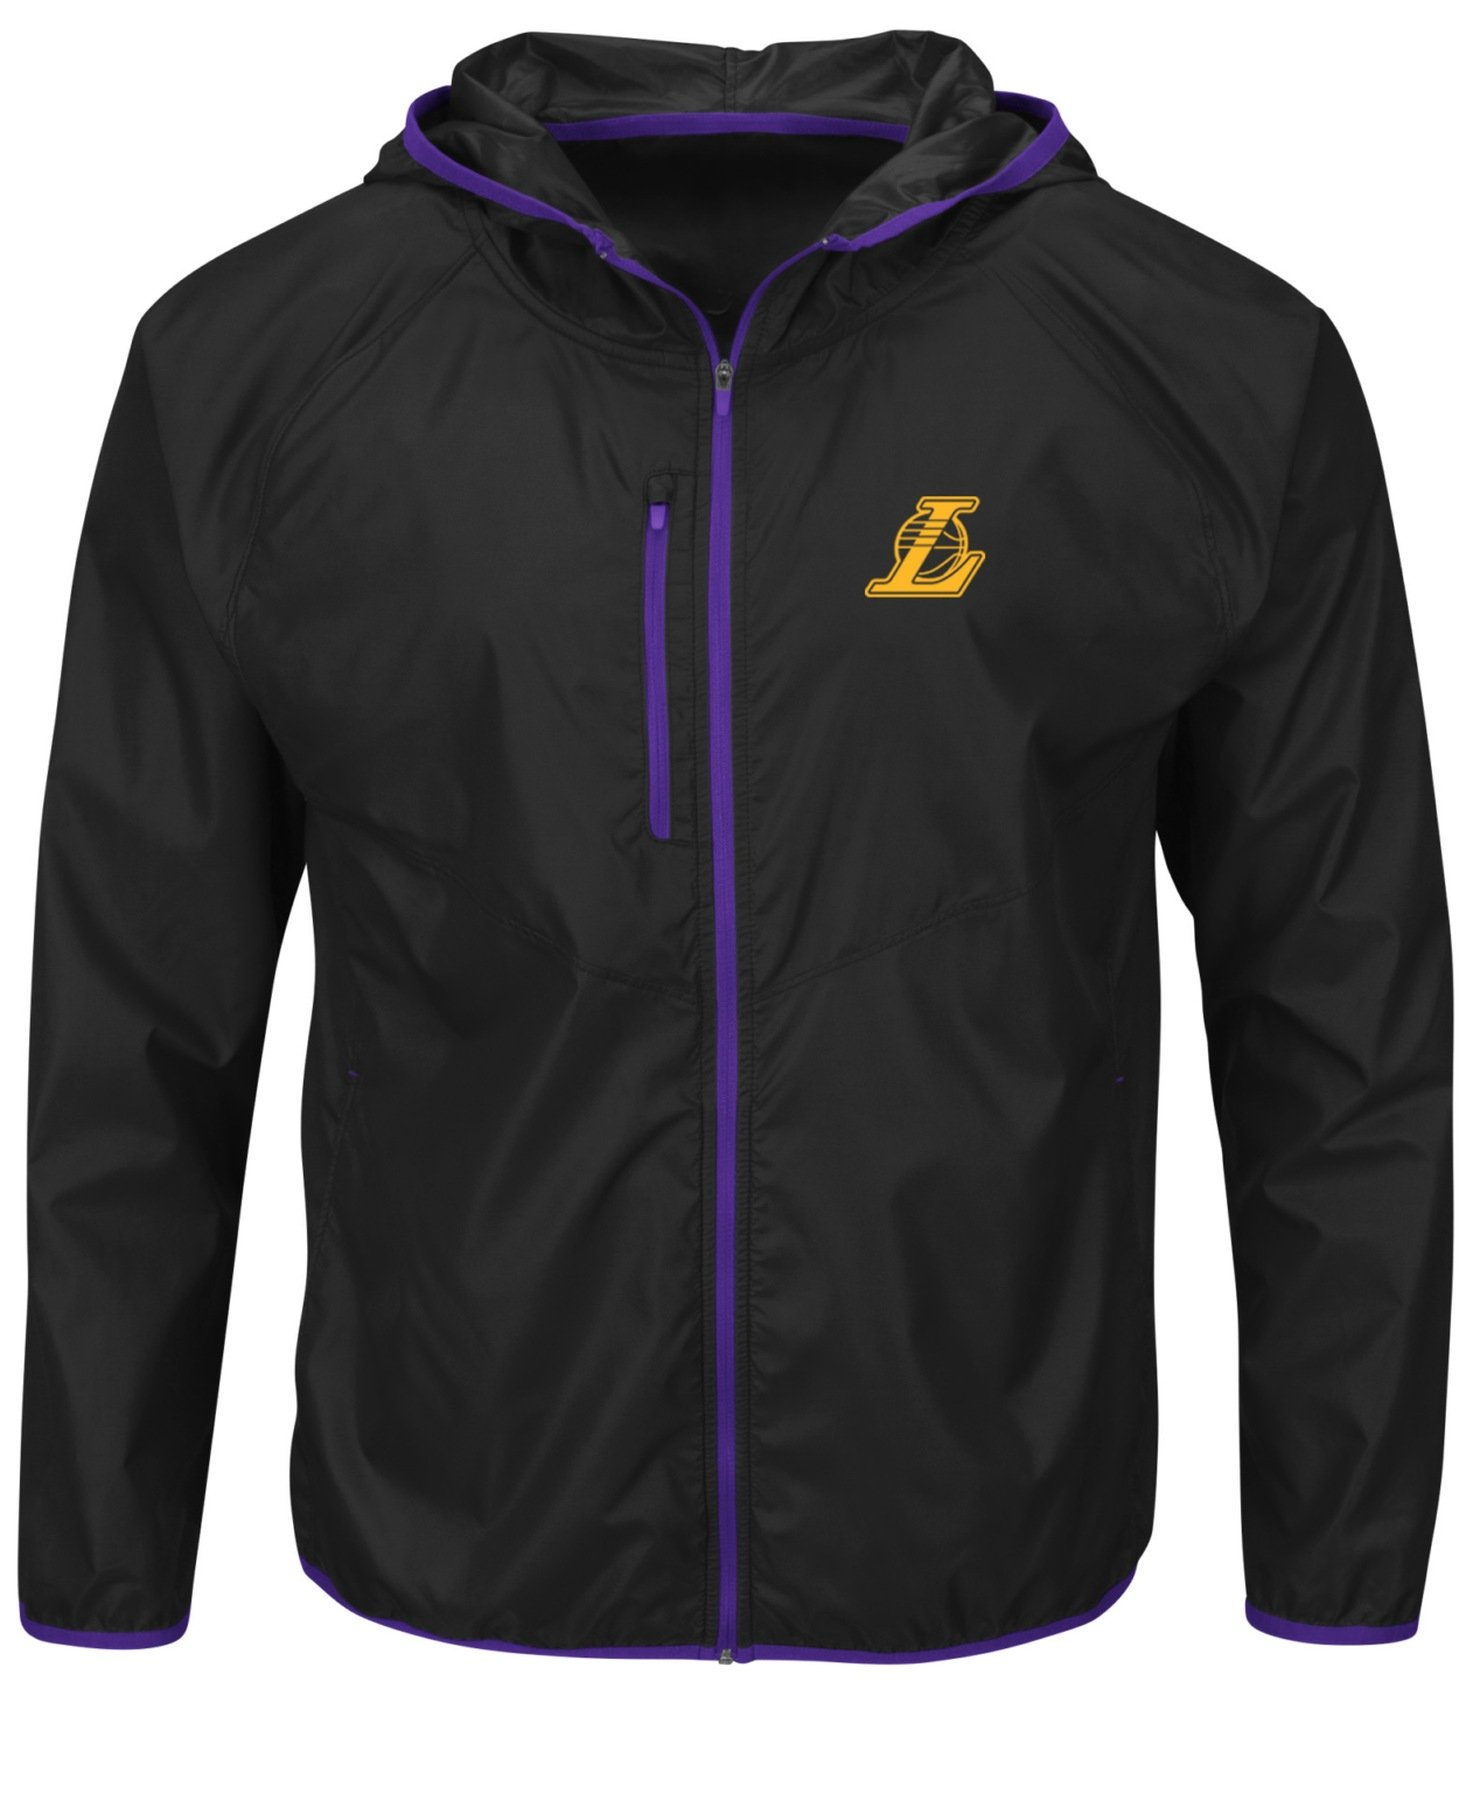 VF LSG NBA Los Angeles Lakers Men's Extraordinary Achievement Long Sleeve Full Zip Jacket, XX-Large, Black/Regal Purple by VF LSG